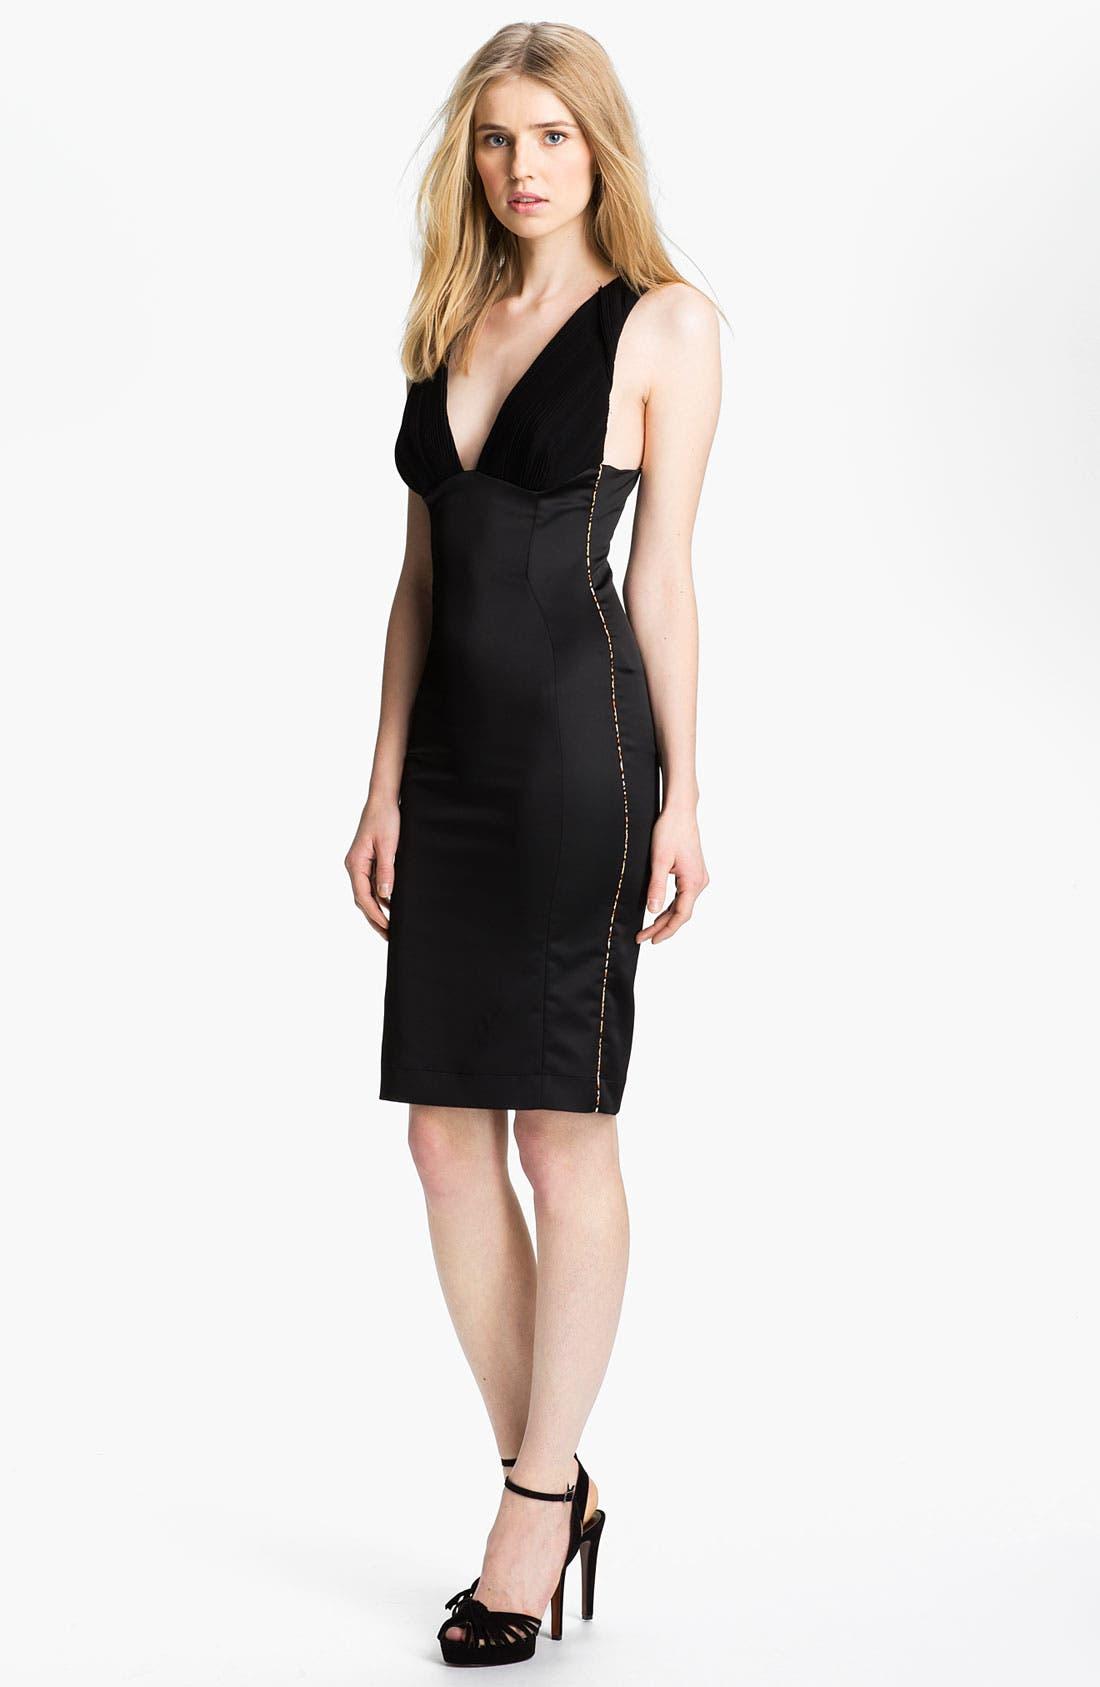 Alternate Image 1 Selected - Just Cavalli Satin & Chiffon Sheath Dress